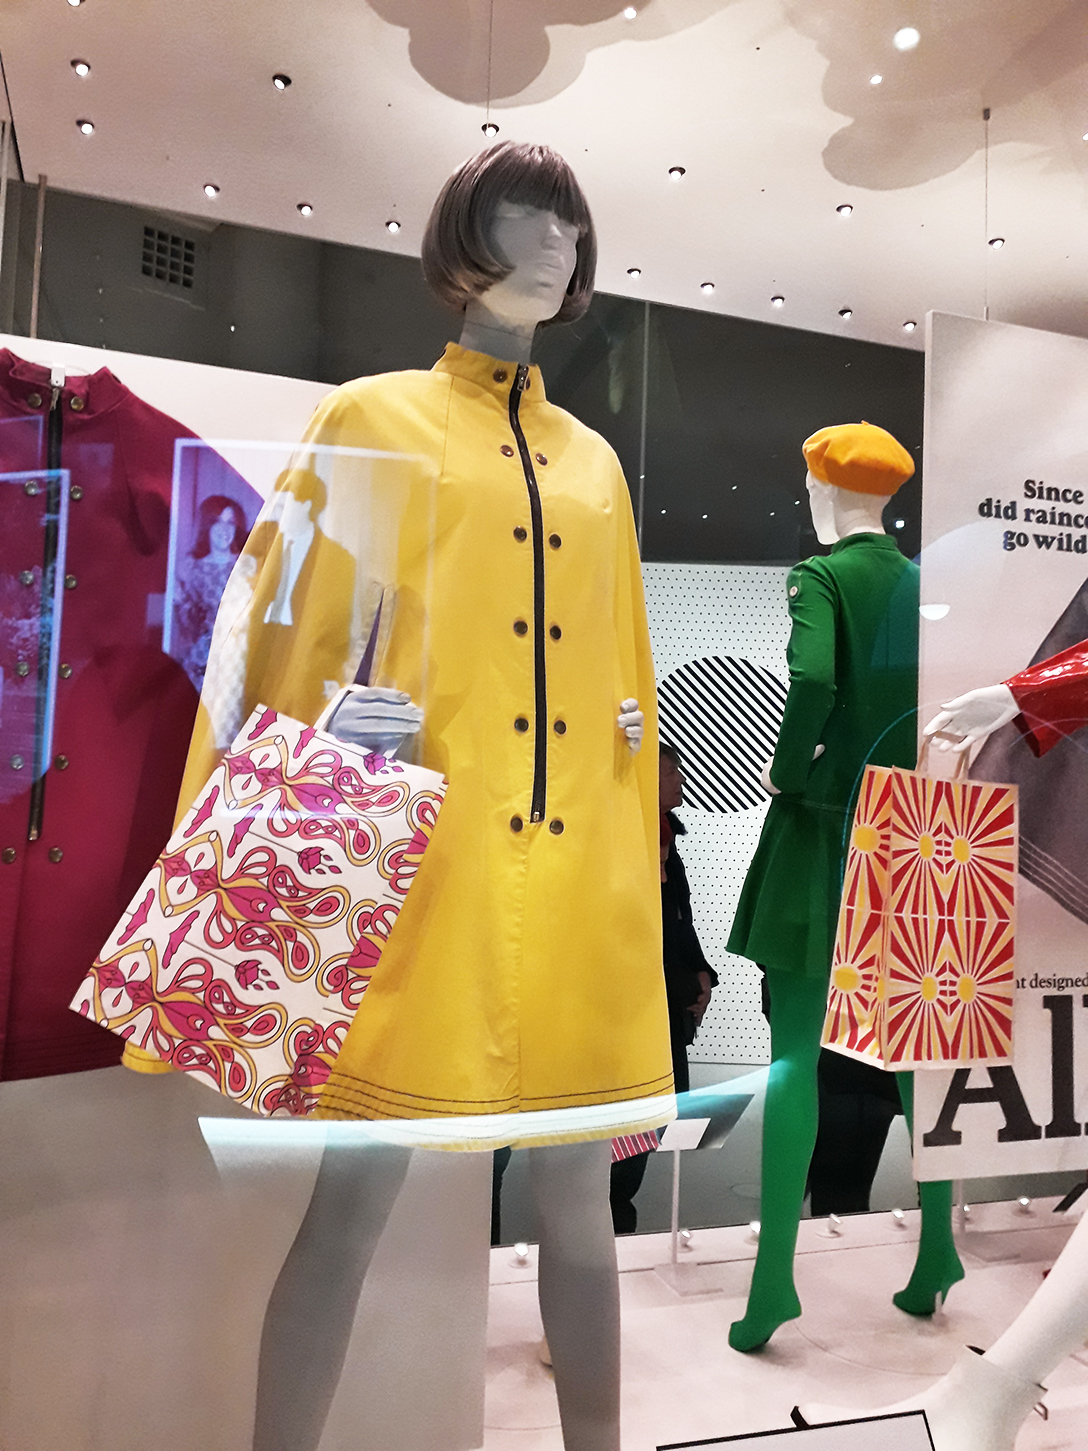 Mary Quant PVC raincoat